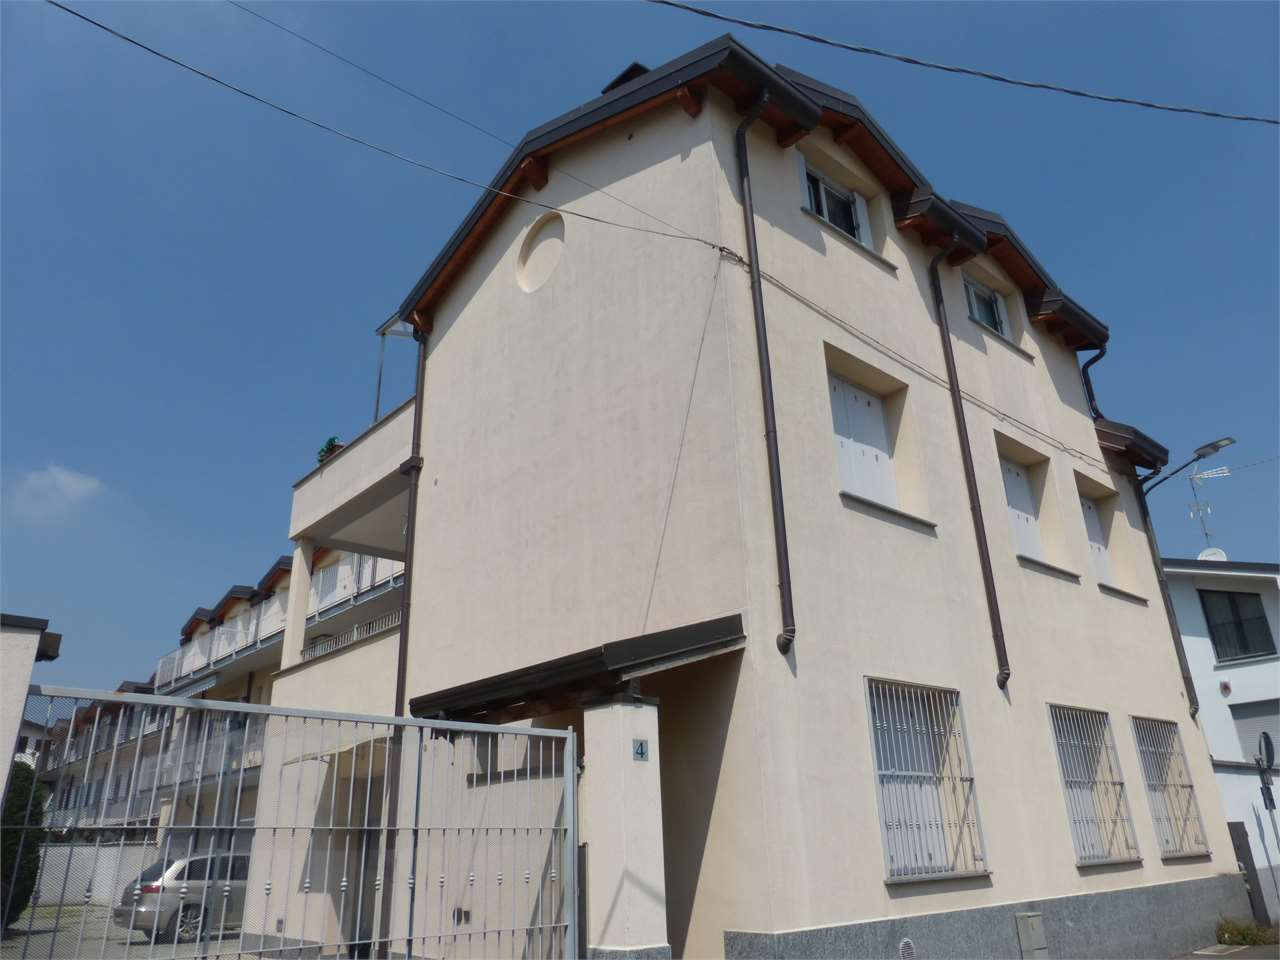 Vendita Bilocale Appartamento Cesano Maderno Via Novara  88111